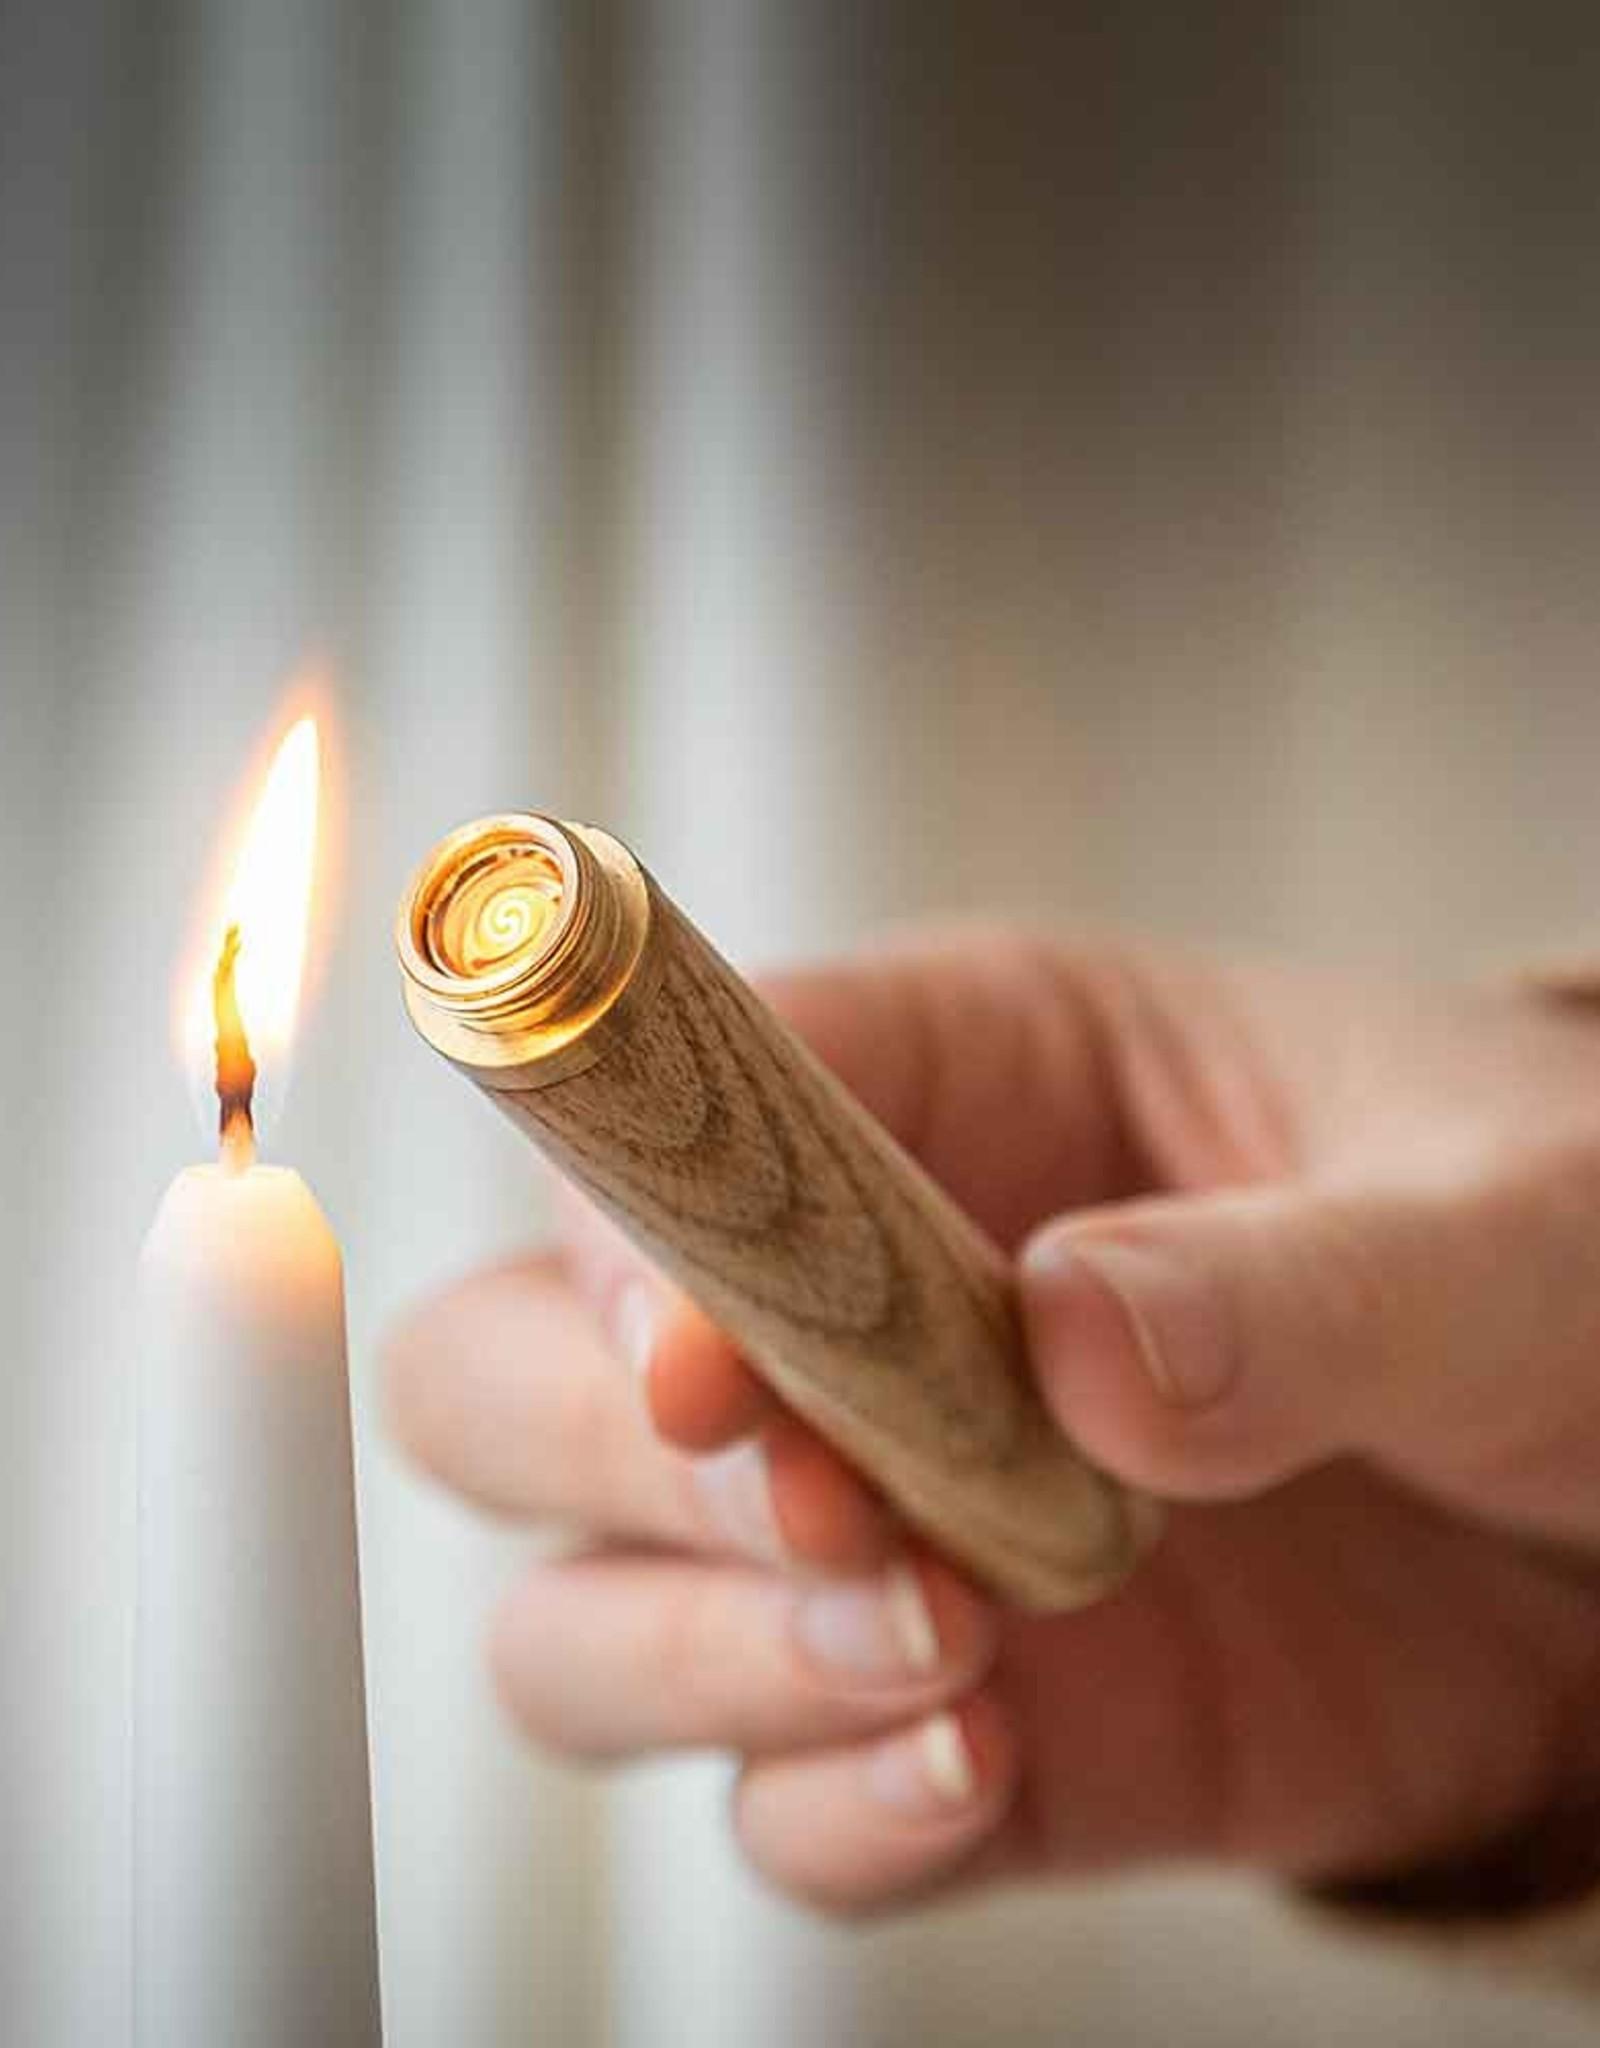 Gingko Flameless Lighter Walnut L: 10.3cm x W: 1.7cm x D: 1.7cm